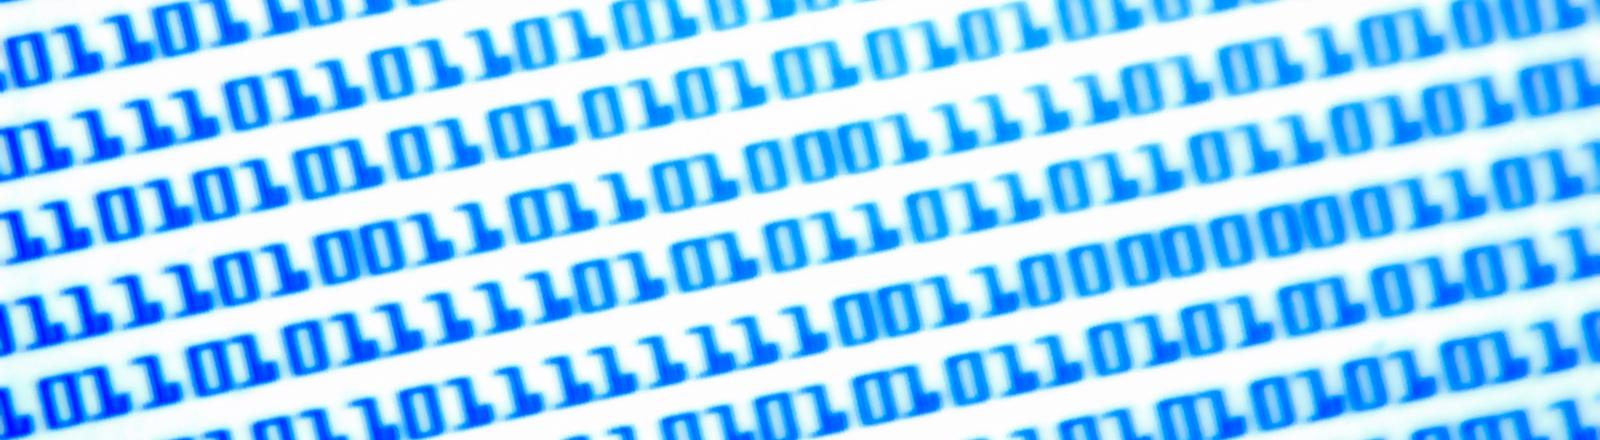 Computerdaten